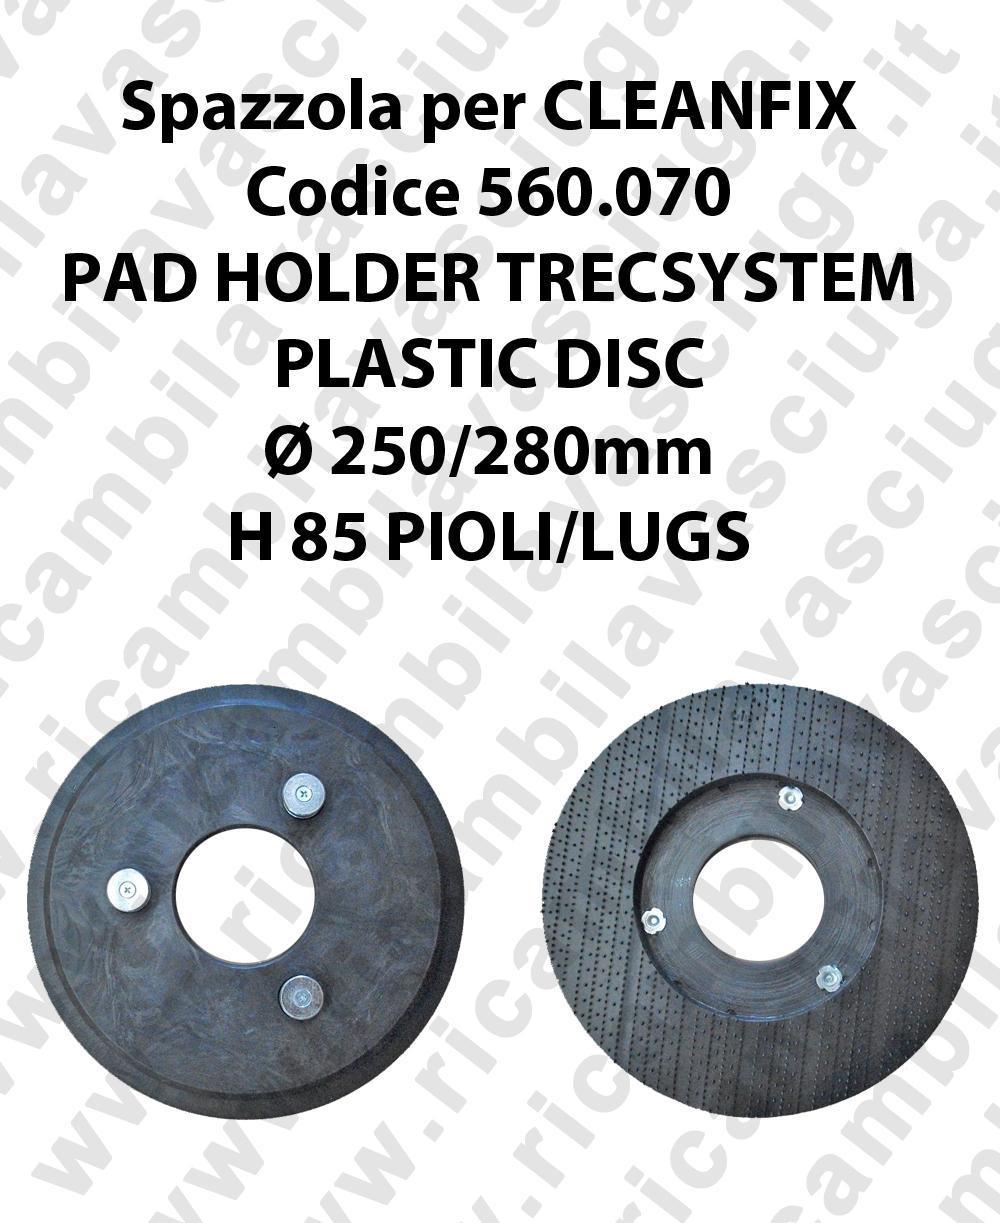 PAD HOLDER TRECSYSTEM  for scrubber dryer CLEANFIX Code 560.070